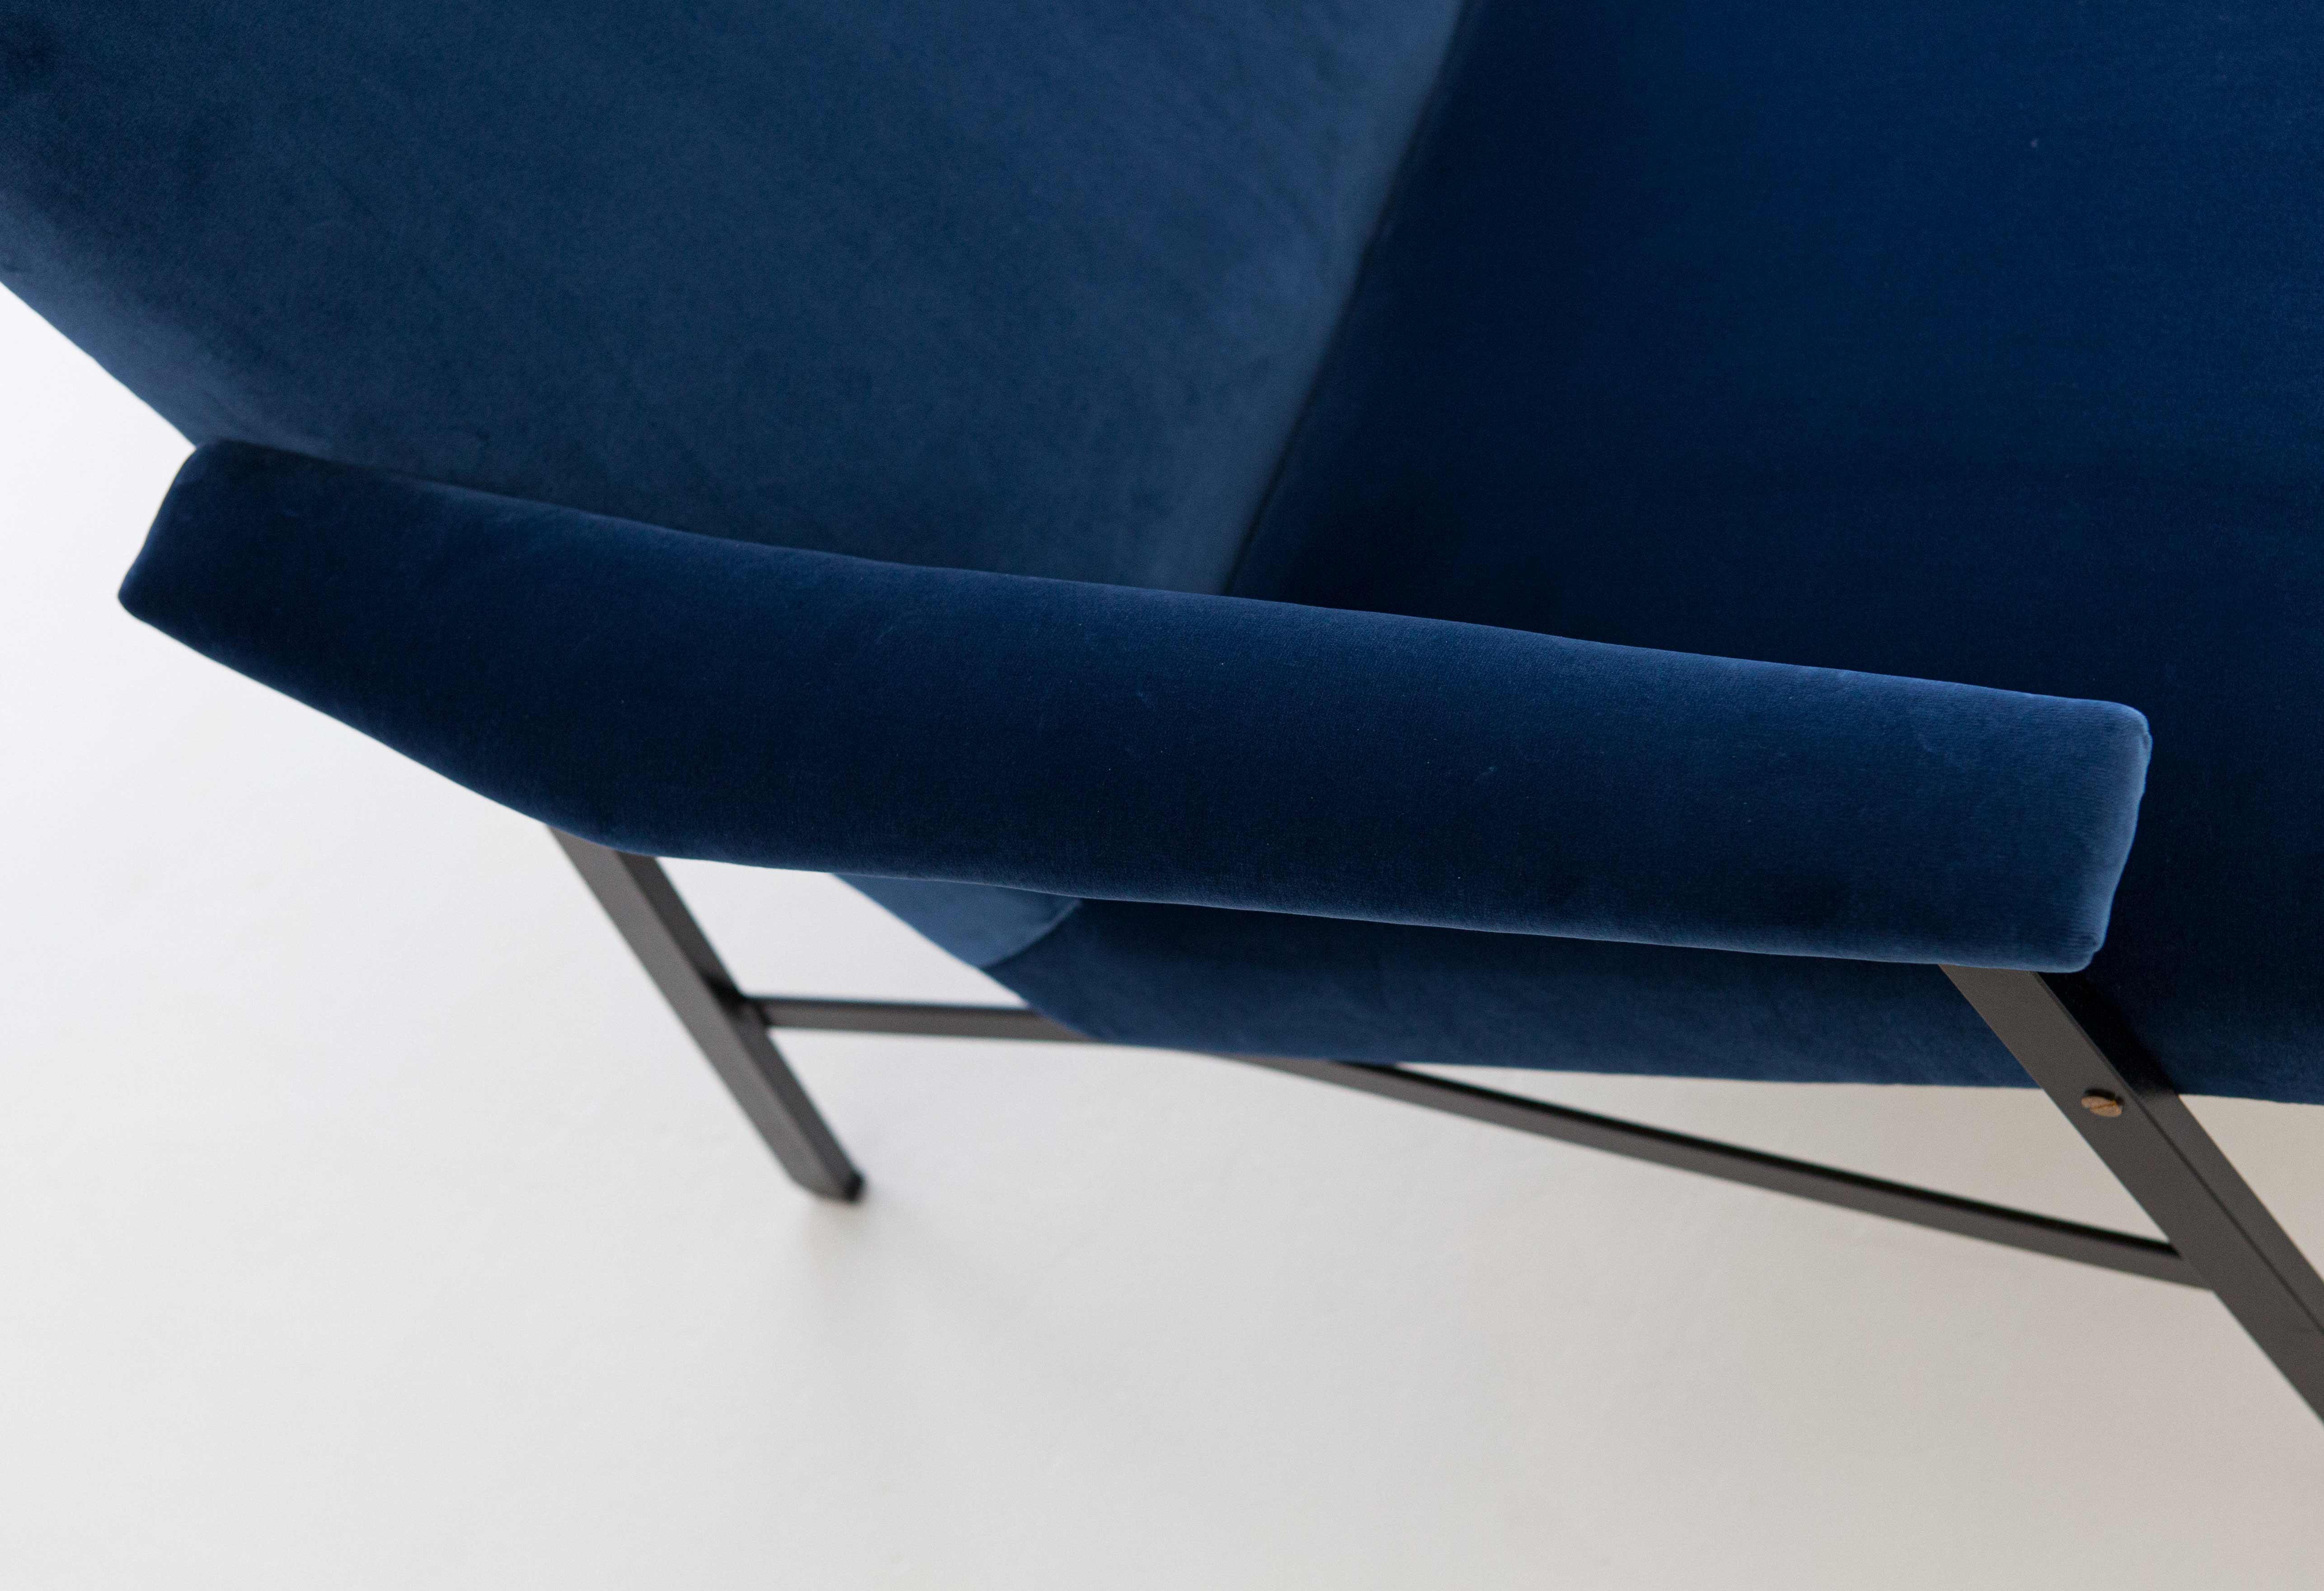 1950s-Italian-blu-velvet-lounge-armchair-8-SE295